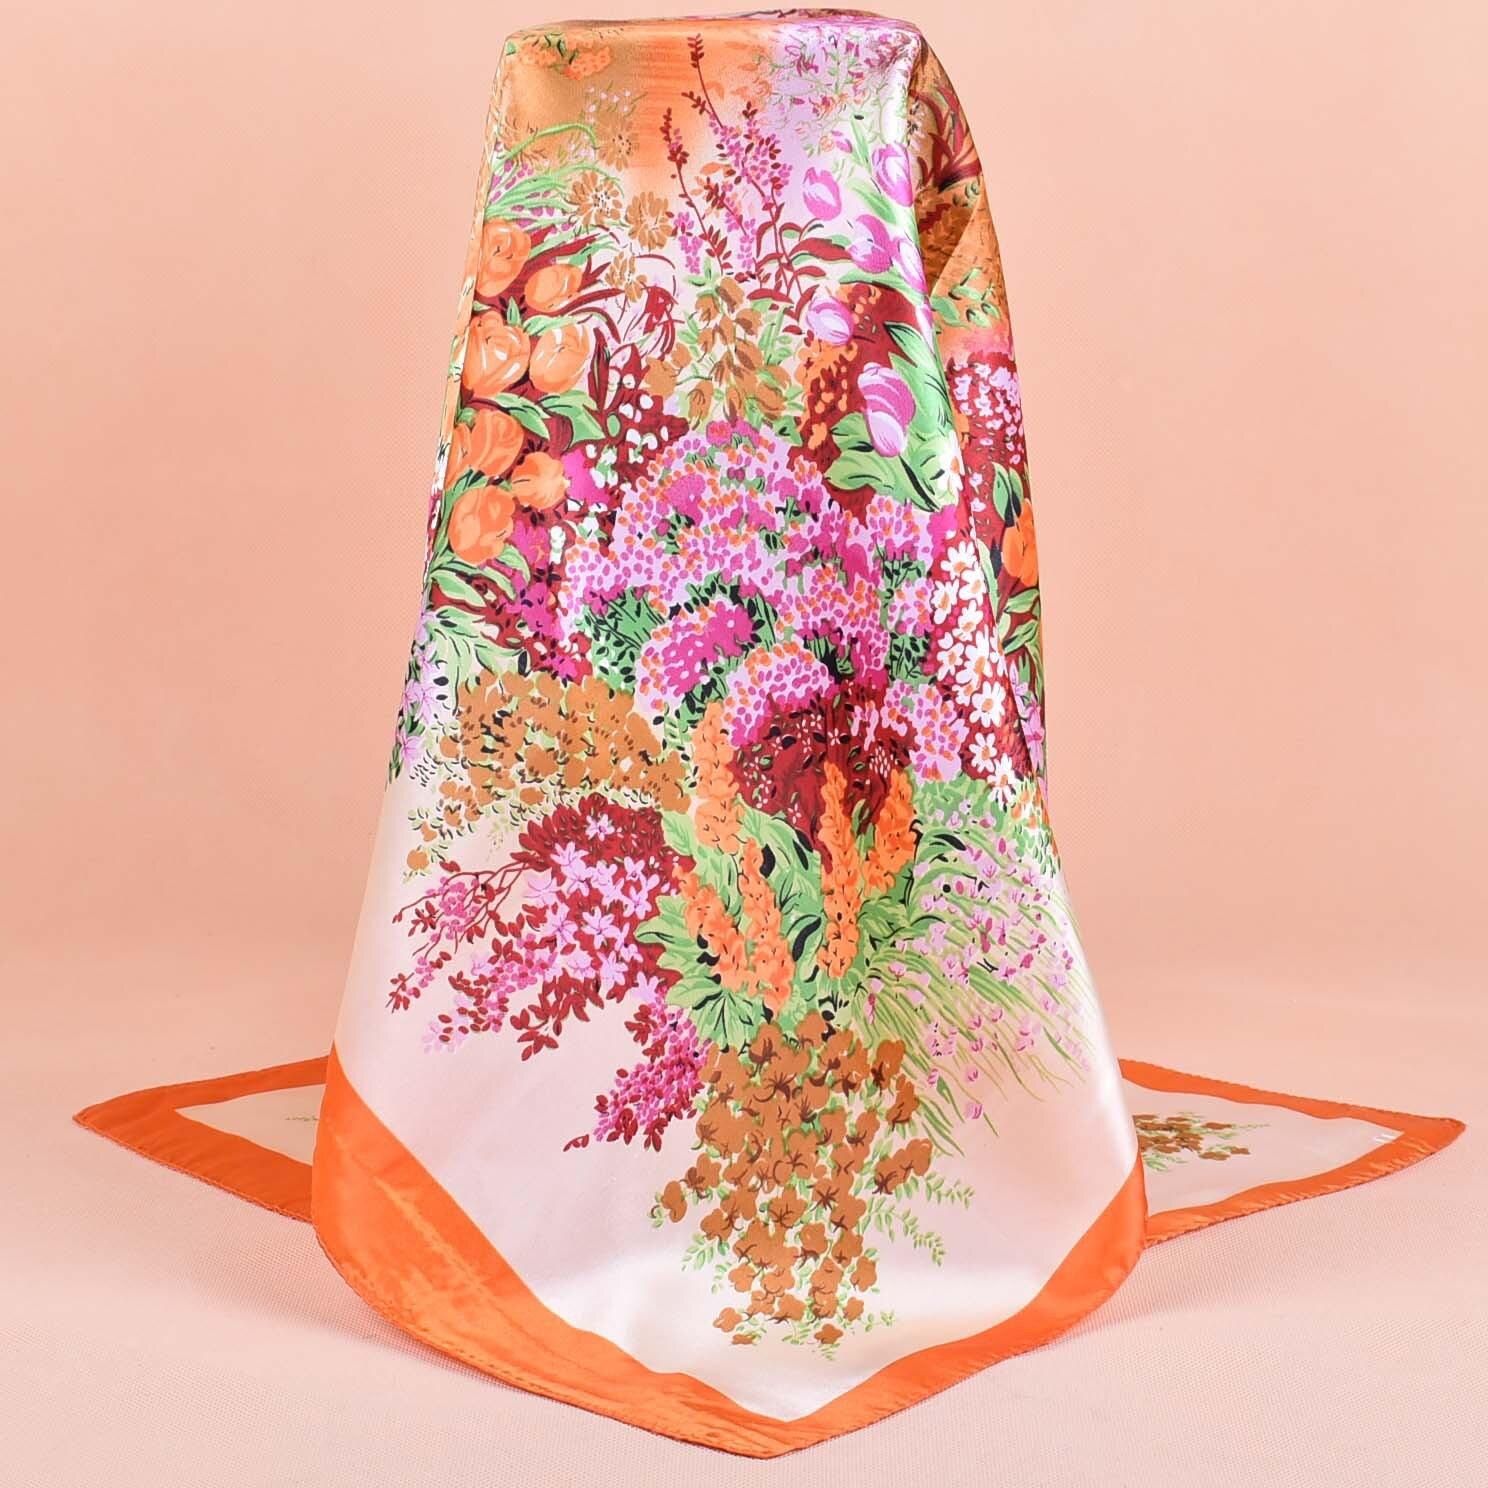 2019 NEW 90cm*90cm New Luxury Print Brand Frame Plaid Striped Women Twill Silk Scarf Small Square Scarves Hijab Headband